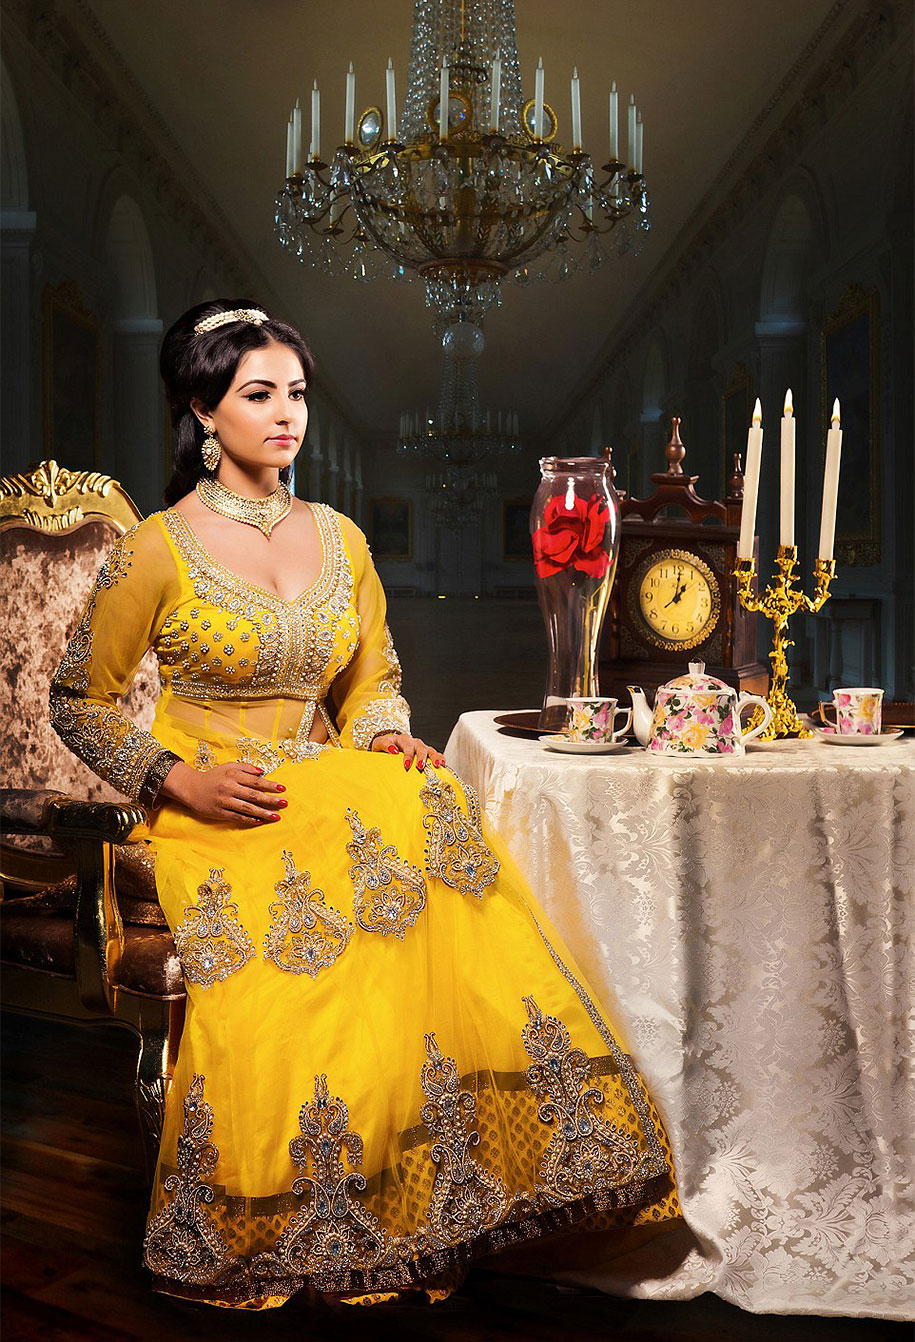 Wedding Dresses From India 37 Unique disney princess bride india